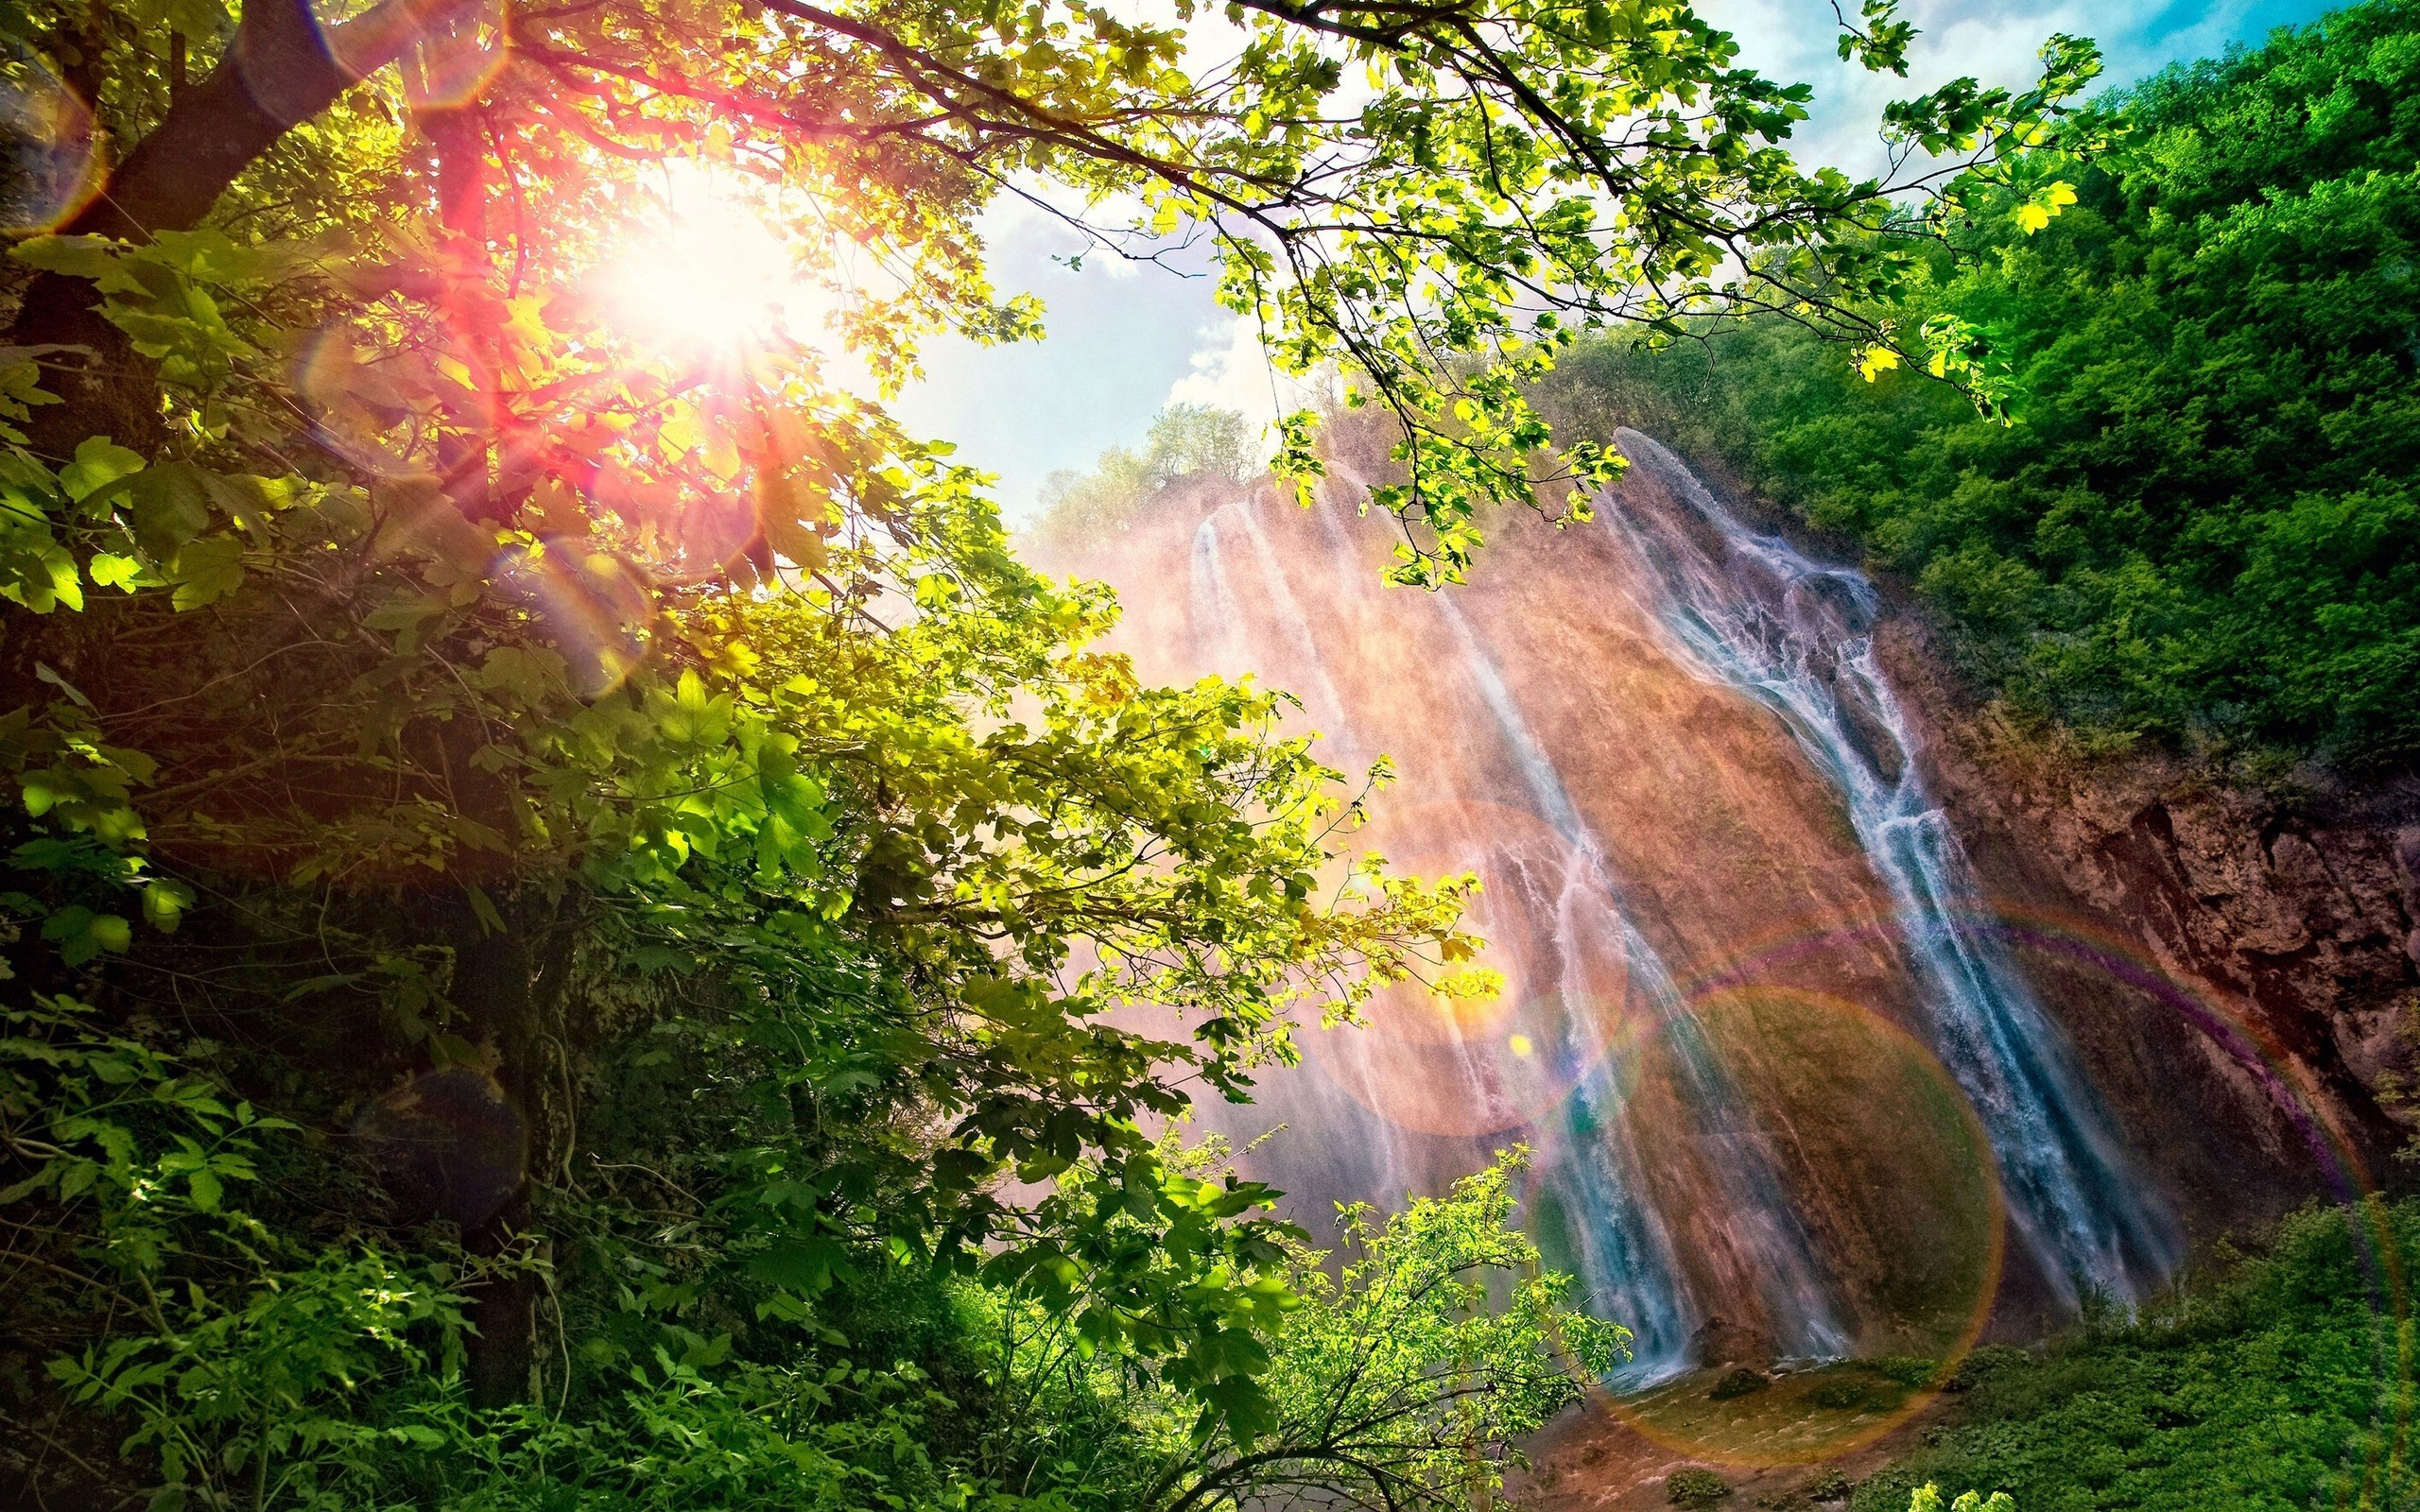 Forest Waterfall Wallpaper HD 34072